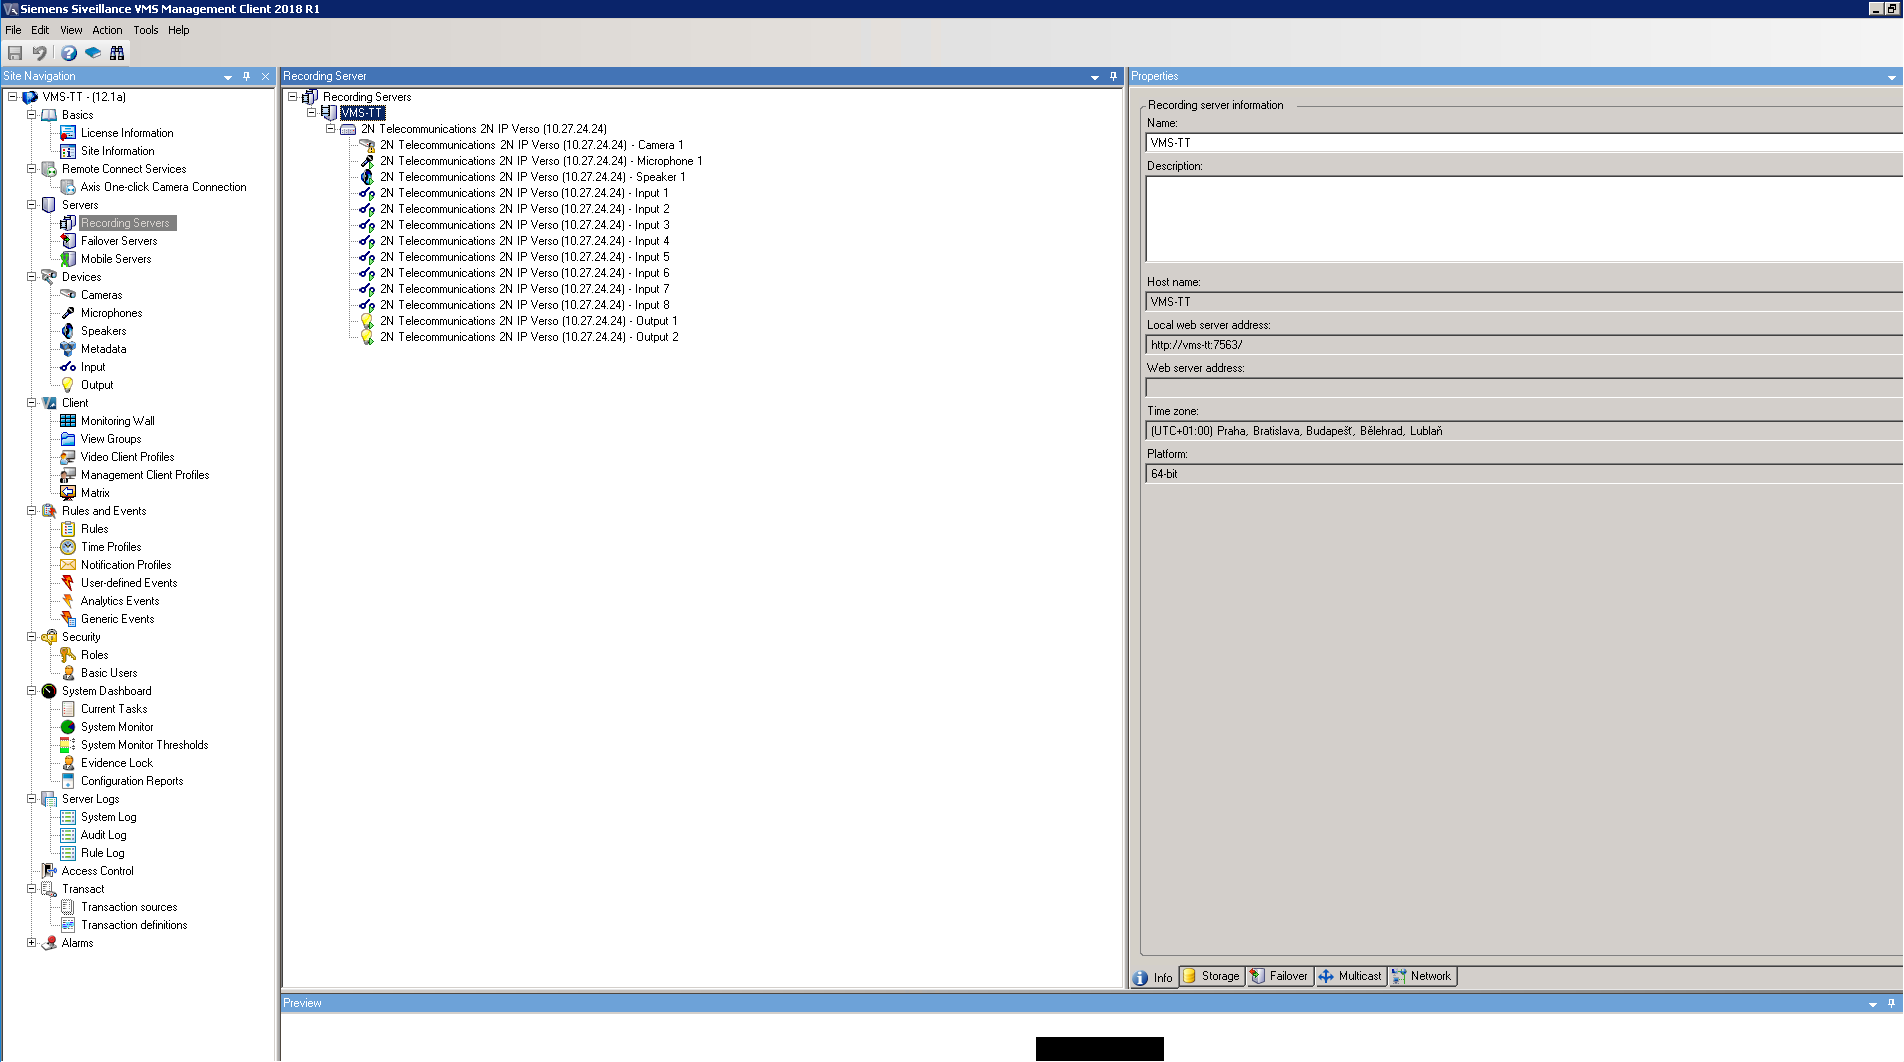 Siemens Siveillance VMS - Interoperability Manual